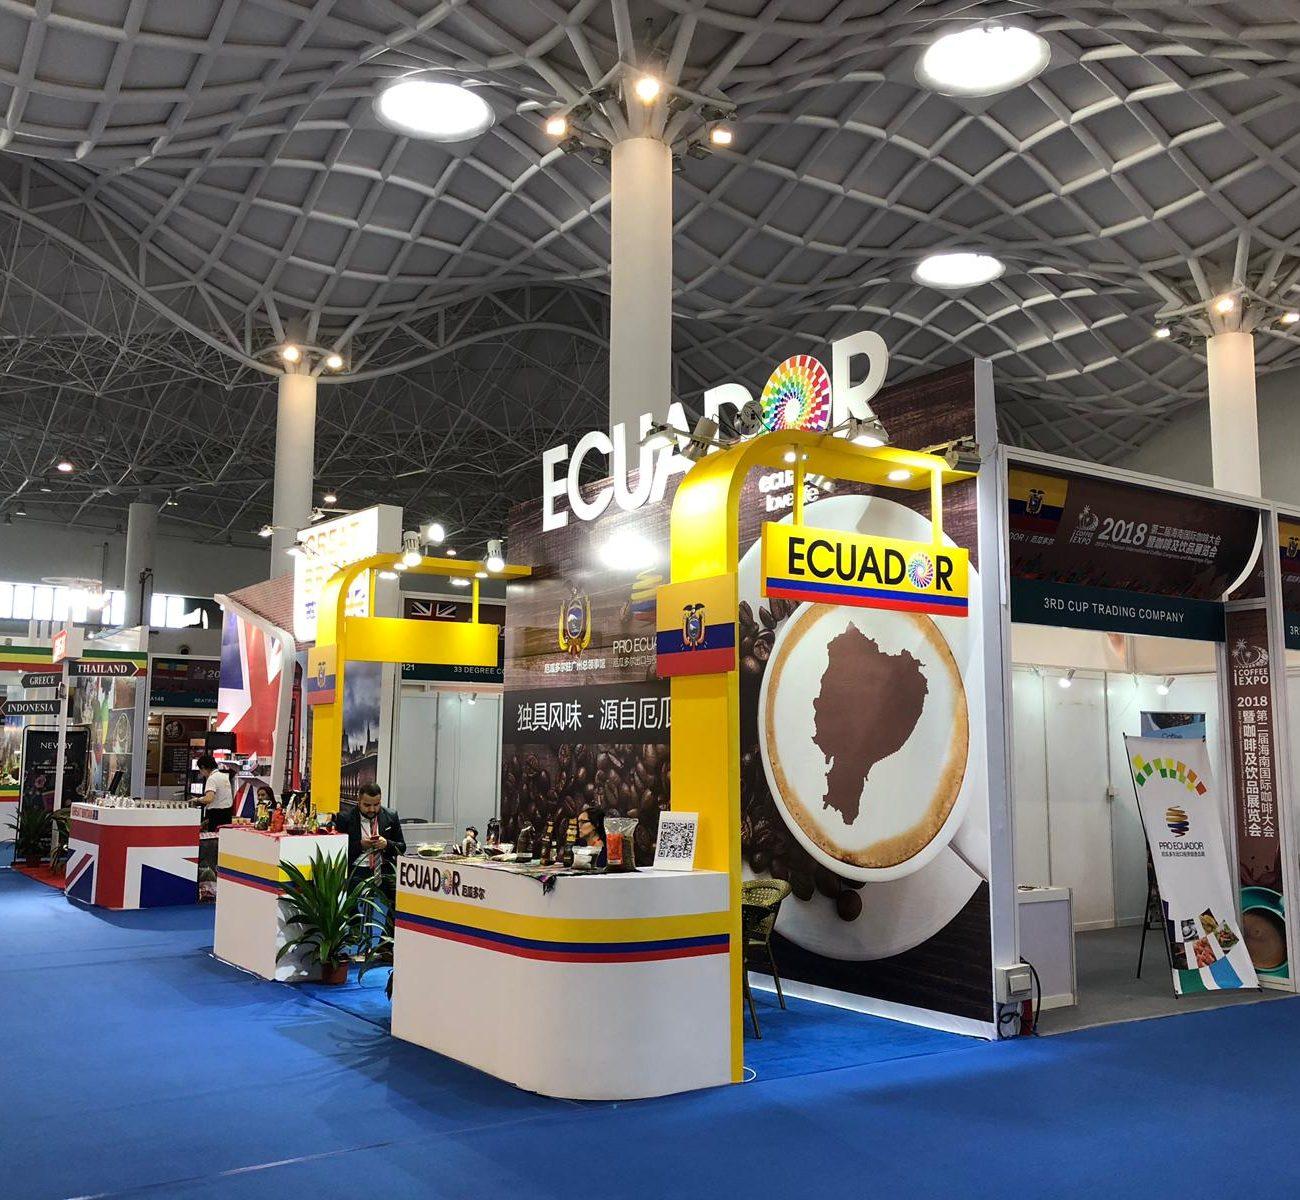 Exhibition International Trade market